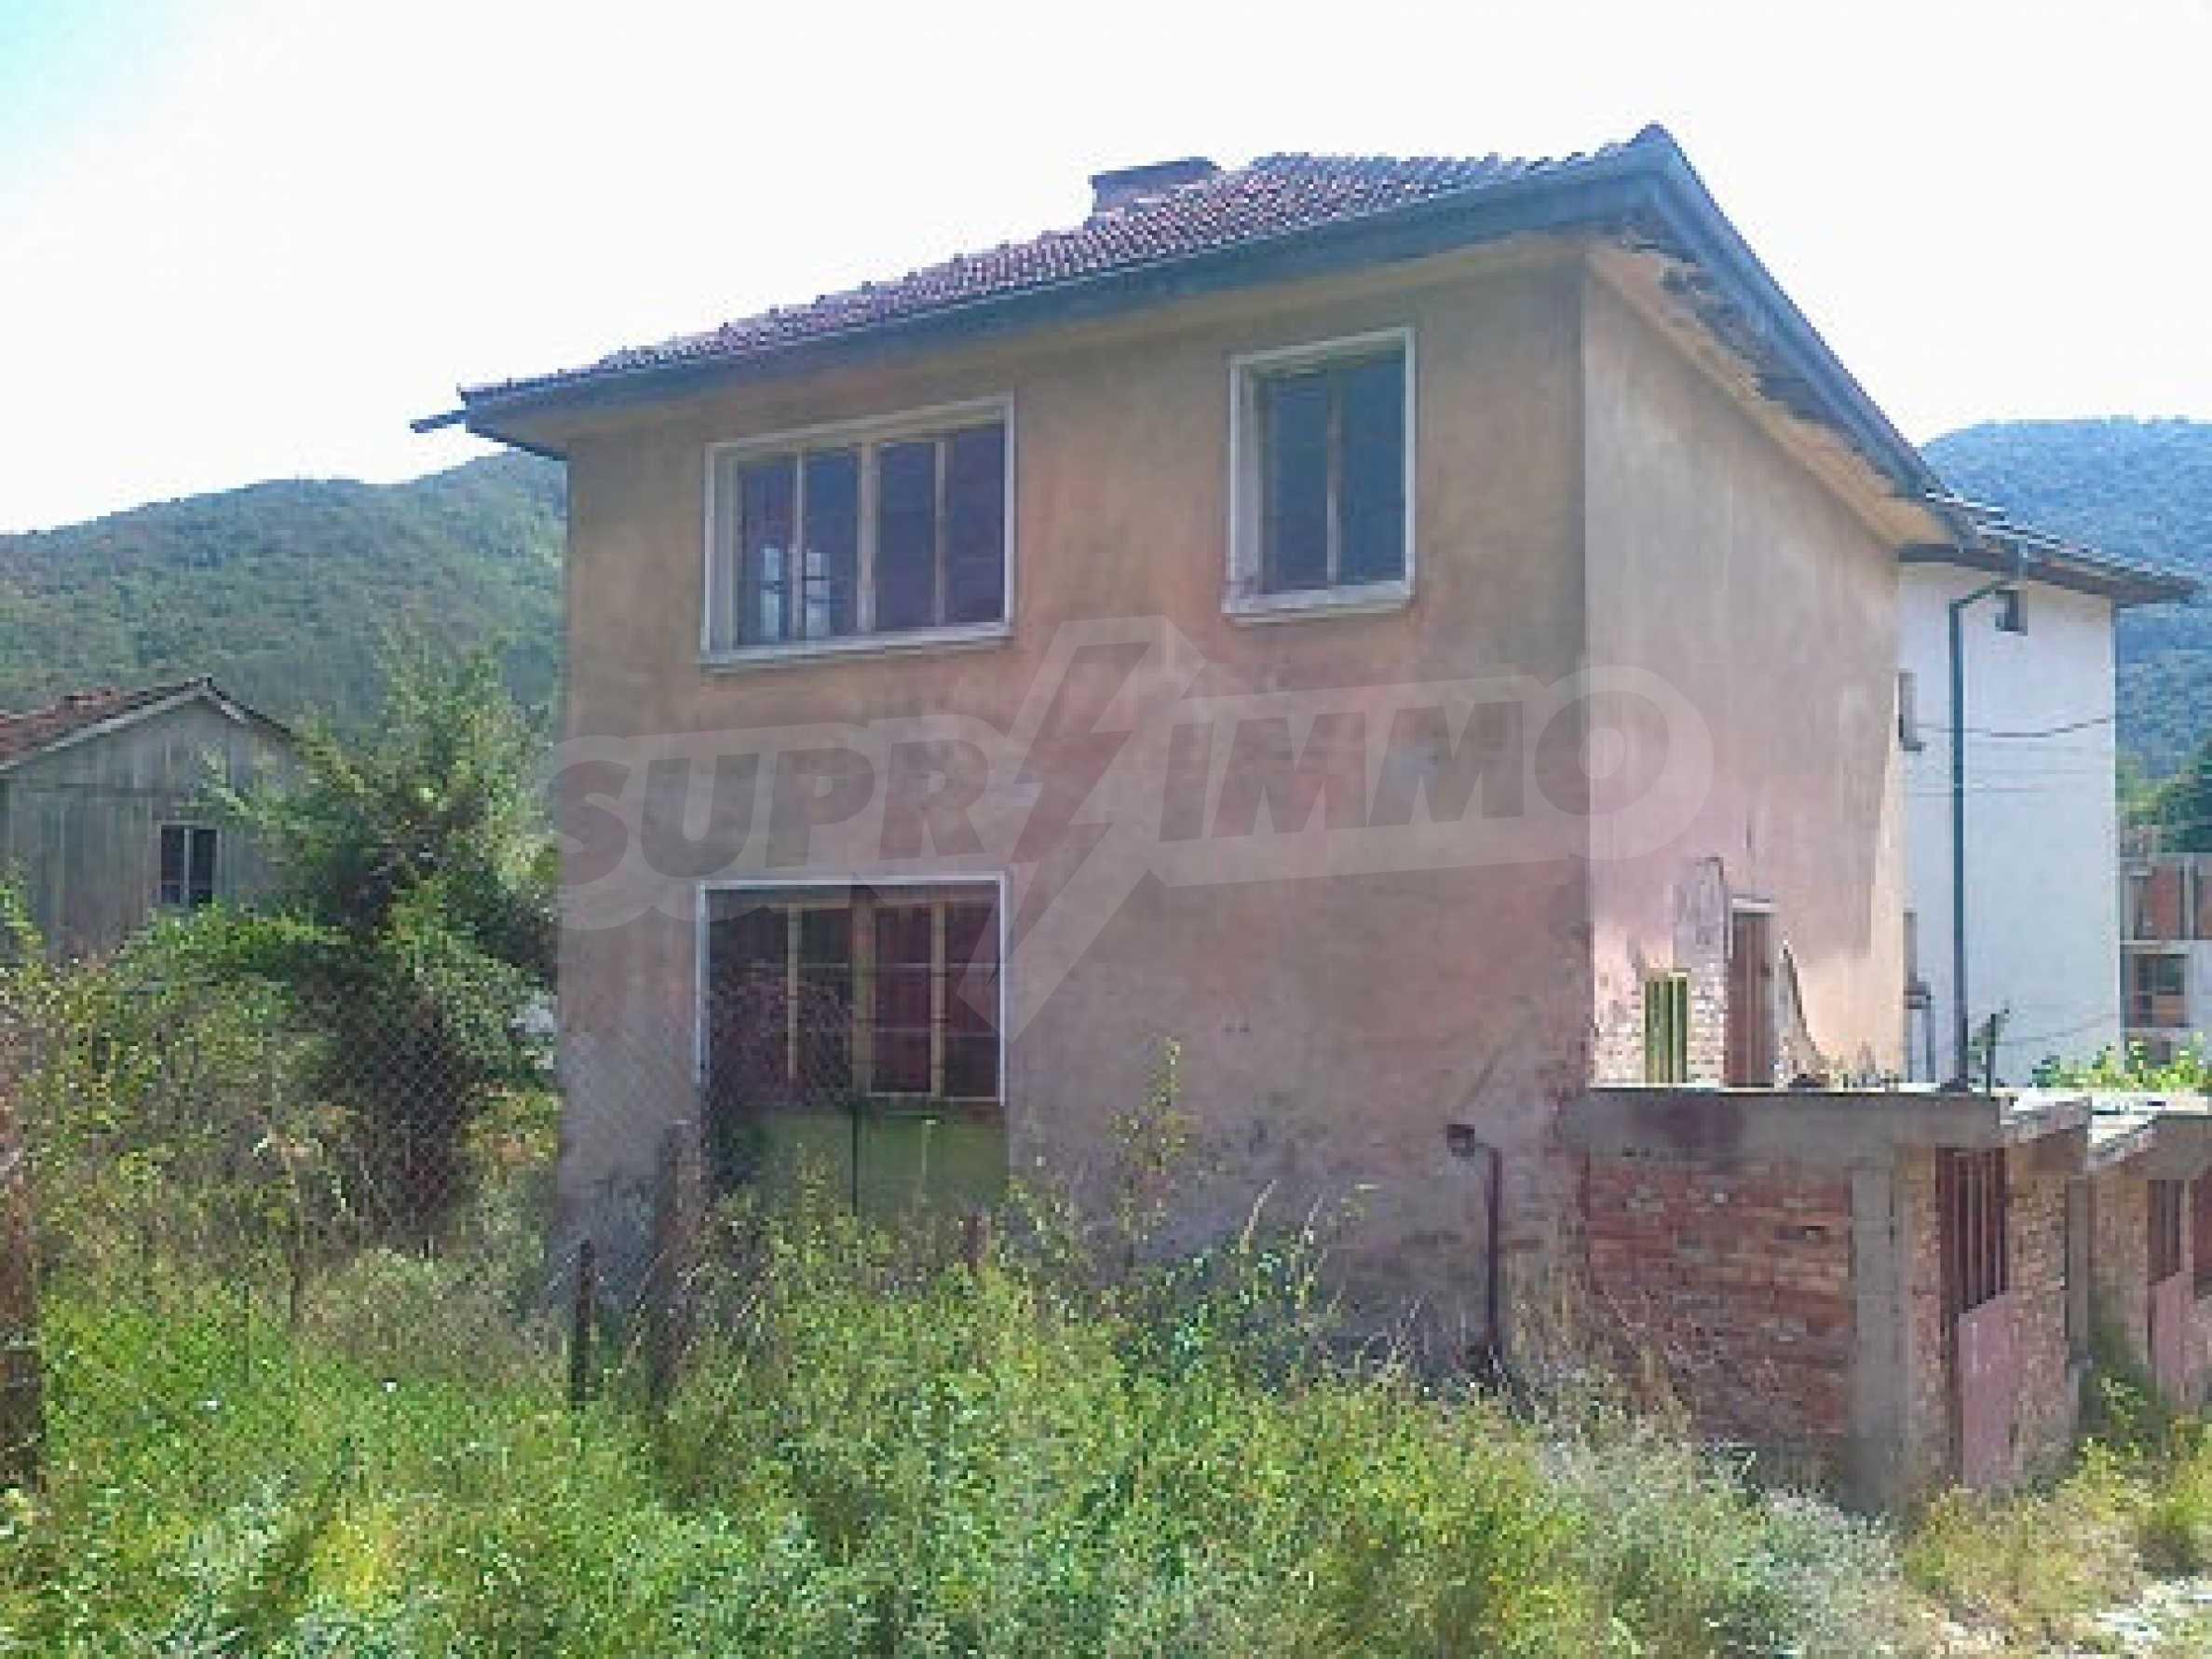 Two-storey house 25 km away from Smolyan 1